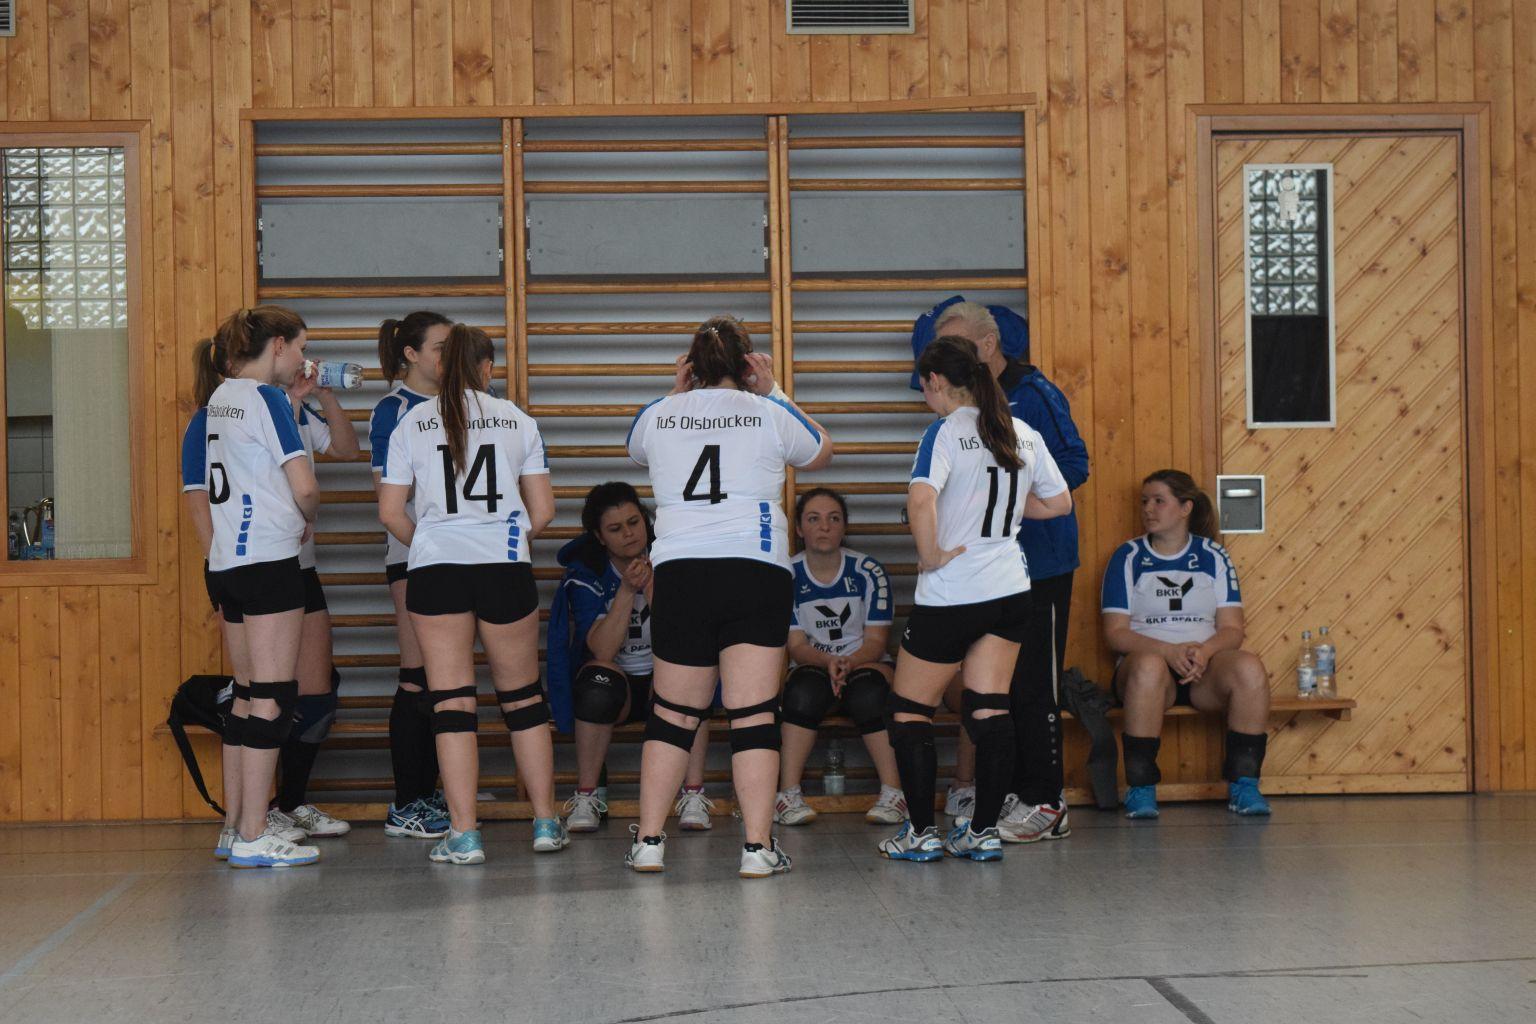 170311_Volleyball_DSC_0027